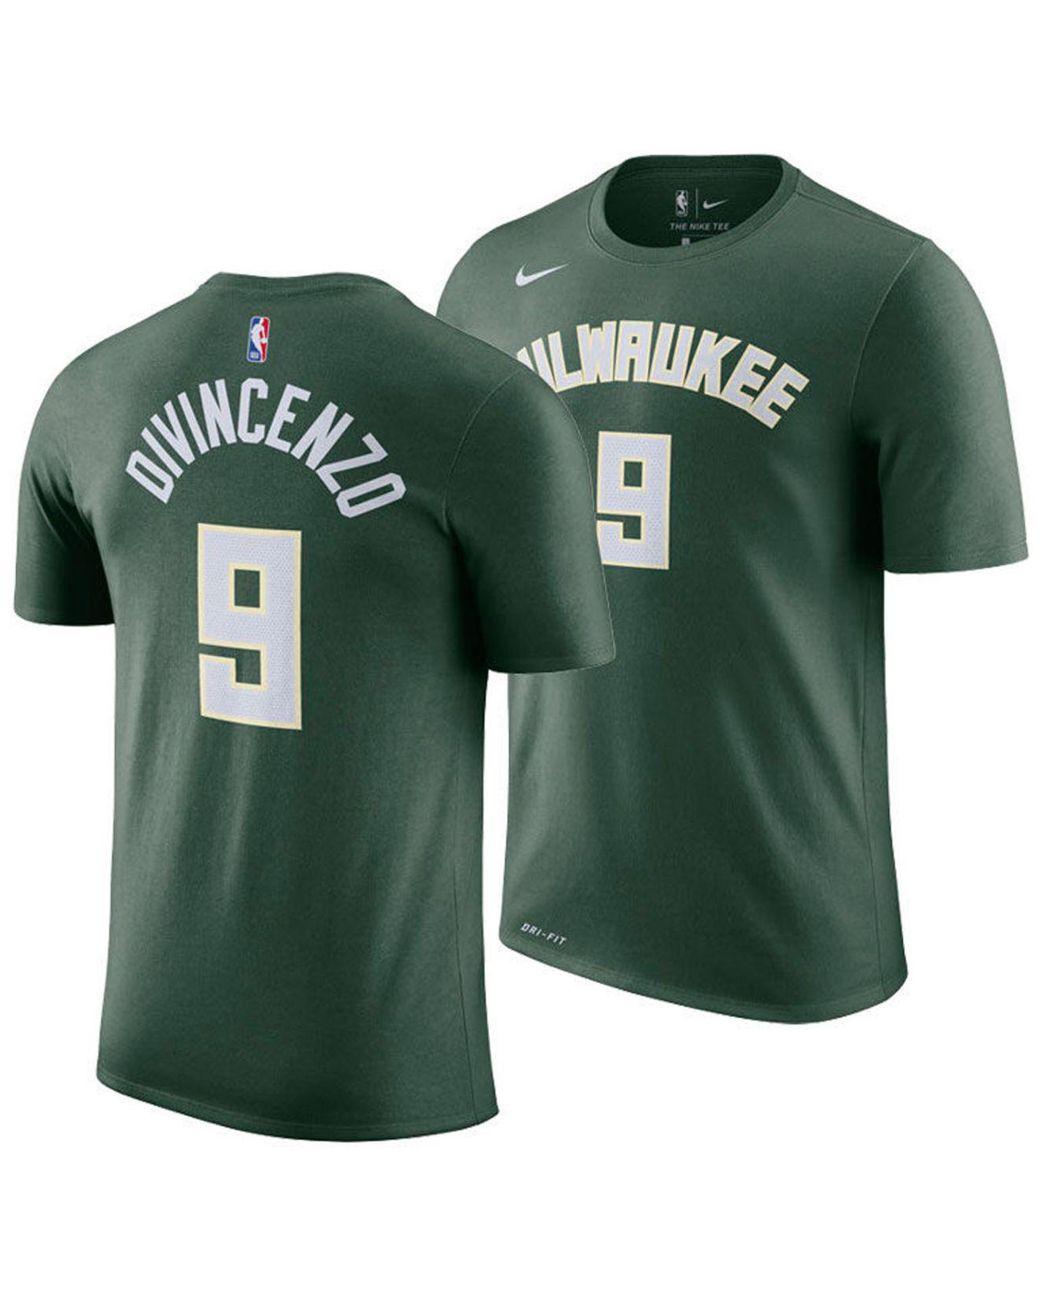 on sale e7c17 58dc6 Men's Green Donte Divincenzo Milwaukee Bucks Icon Player T-shirt